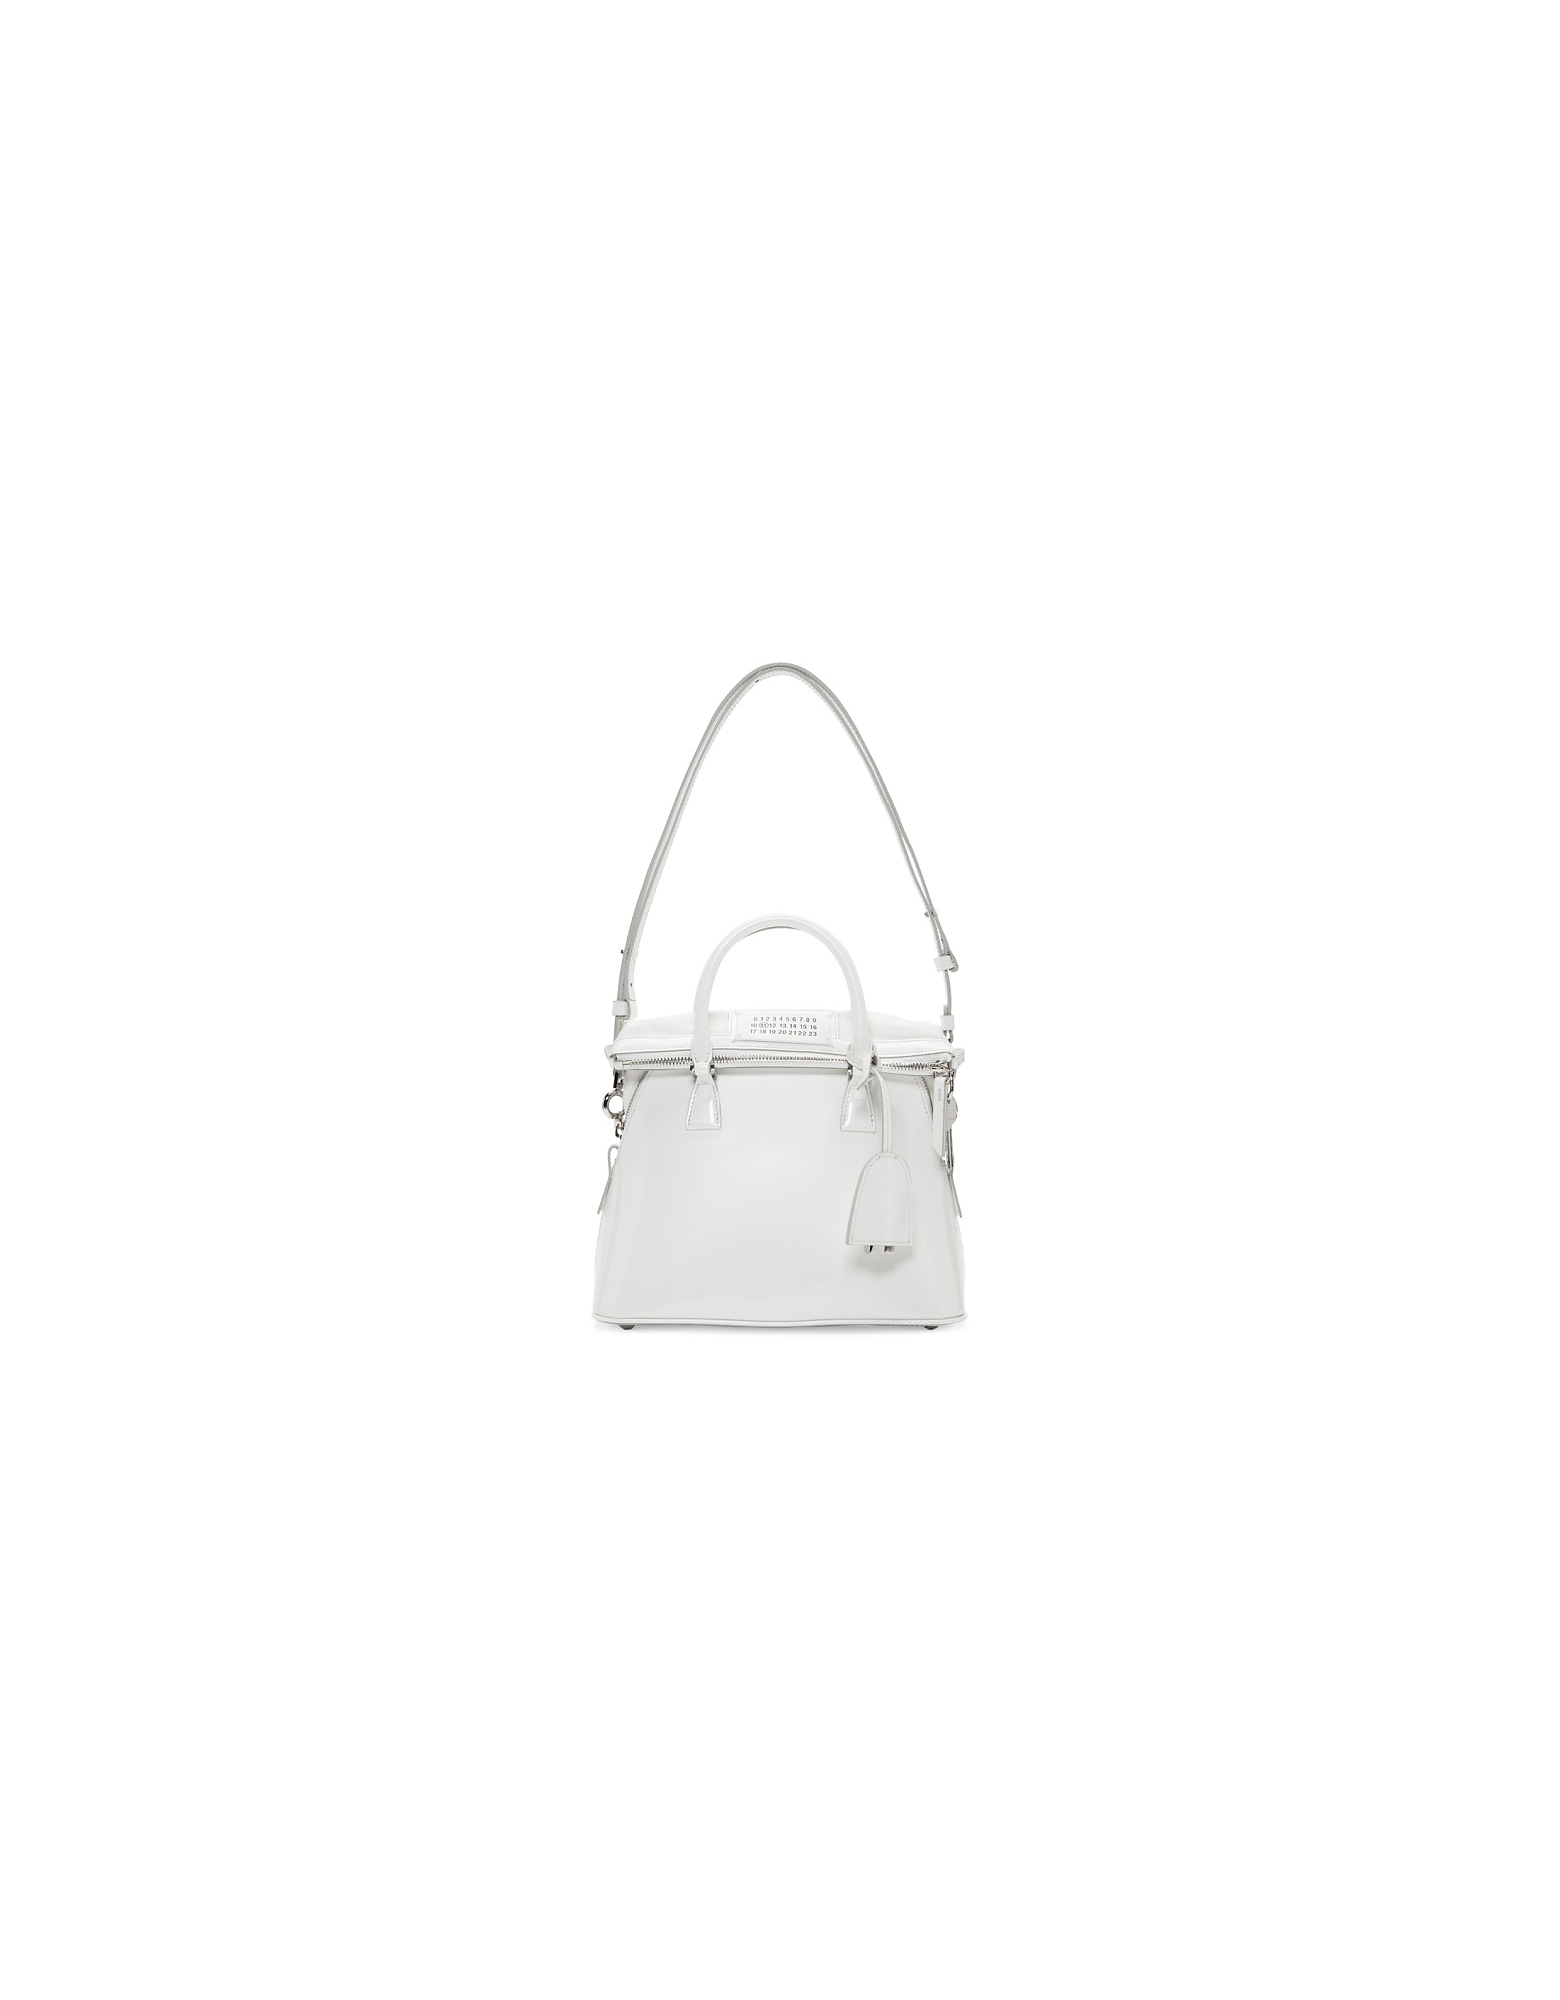 Maison Margiela Designer Handbags, White Medium Patent 5AC Bag